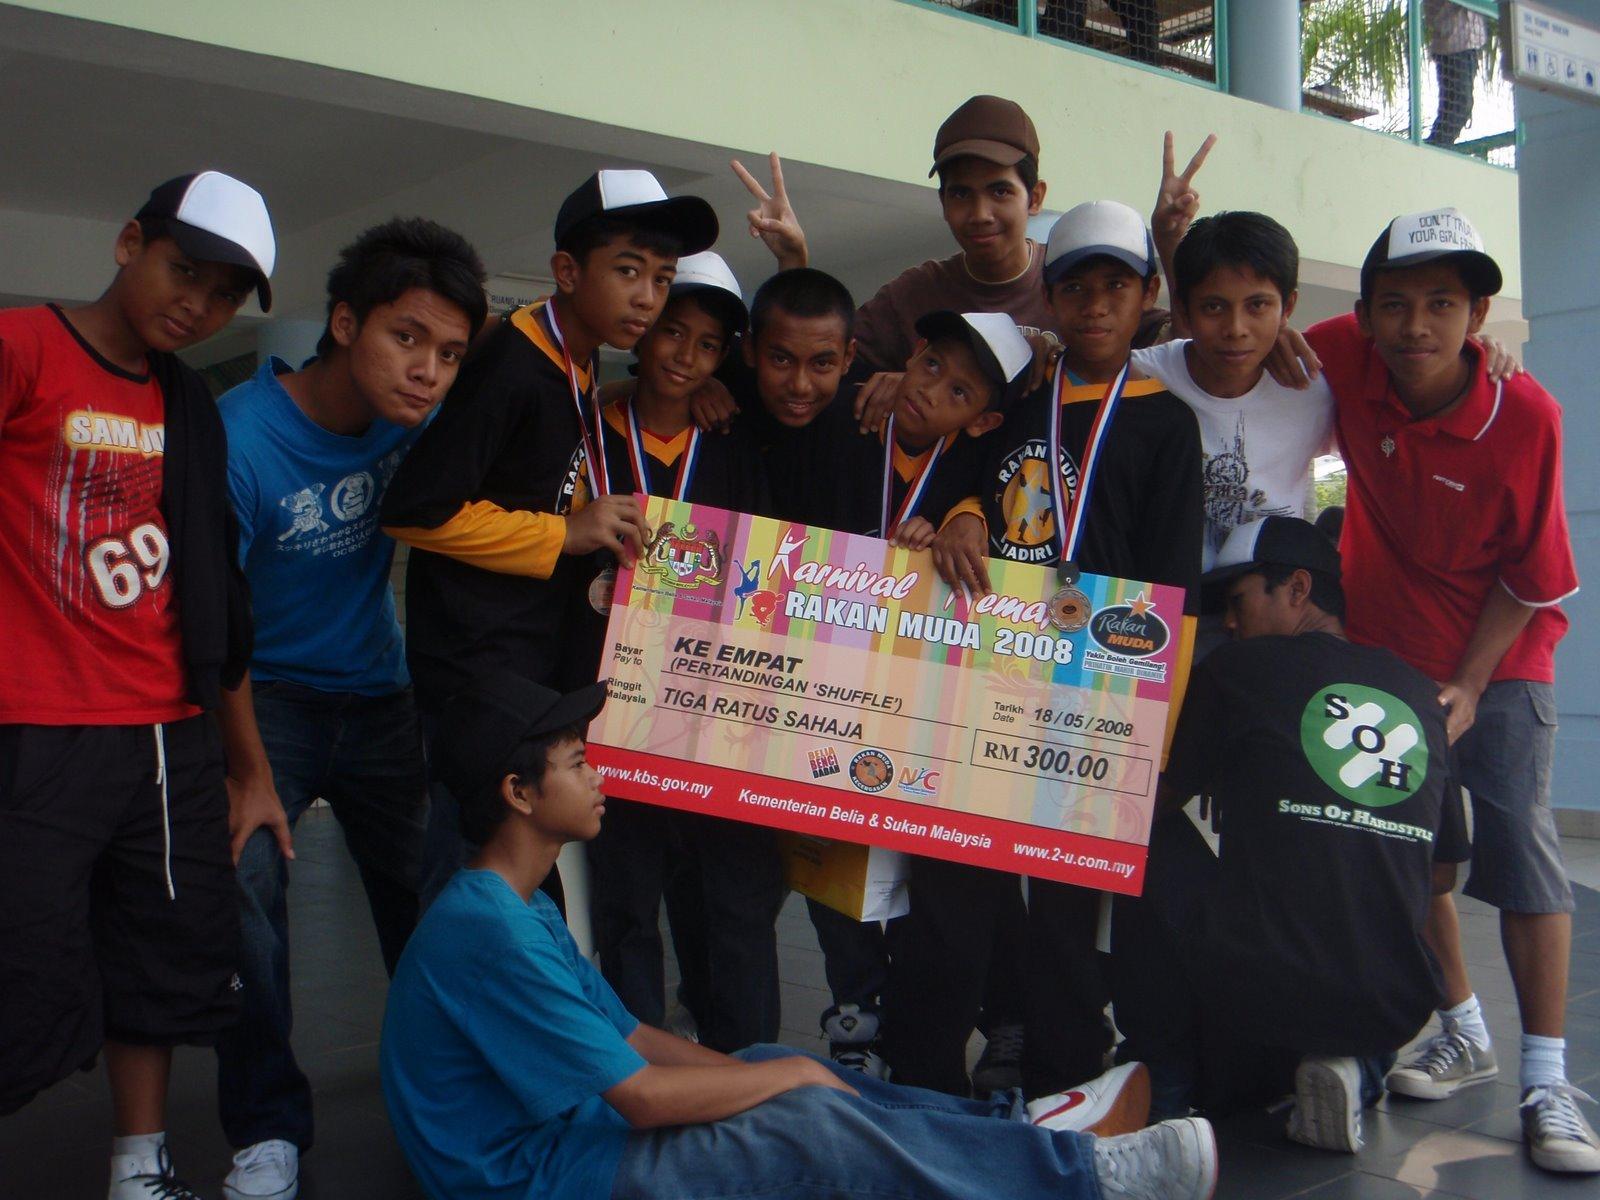 Karnival Remaja - Pertandingan Shuffle